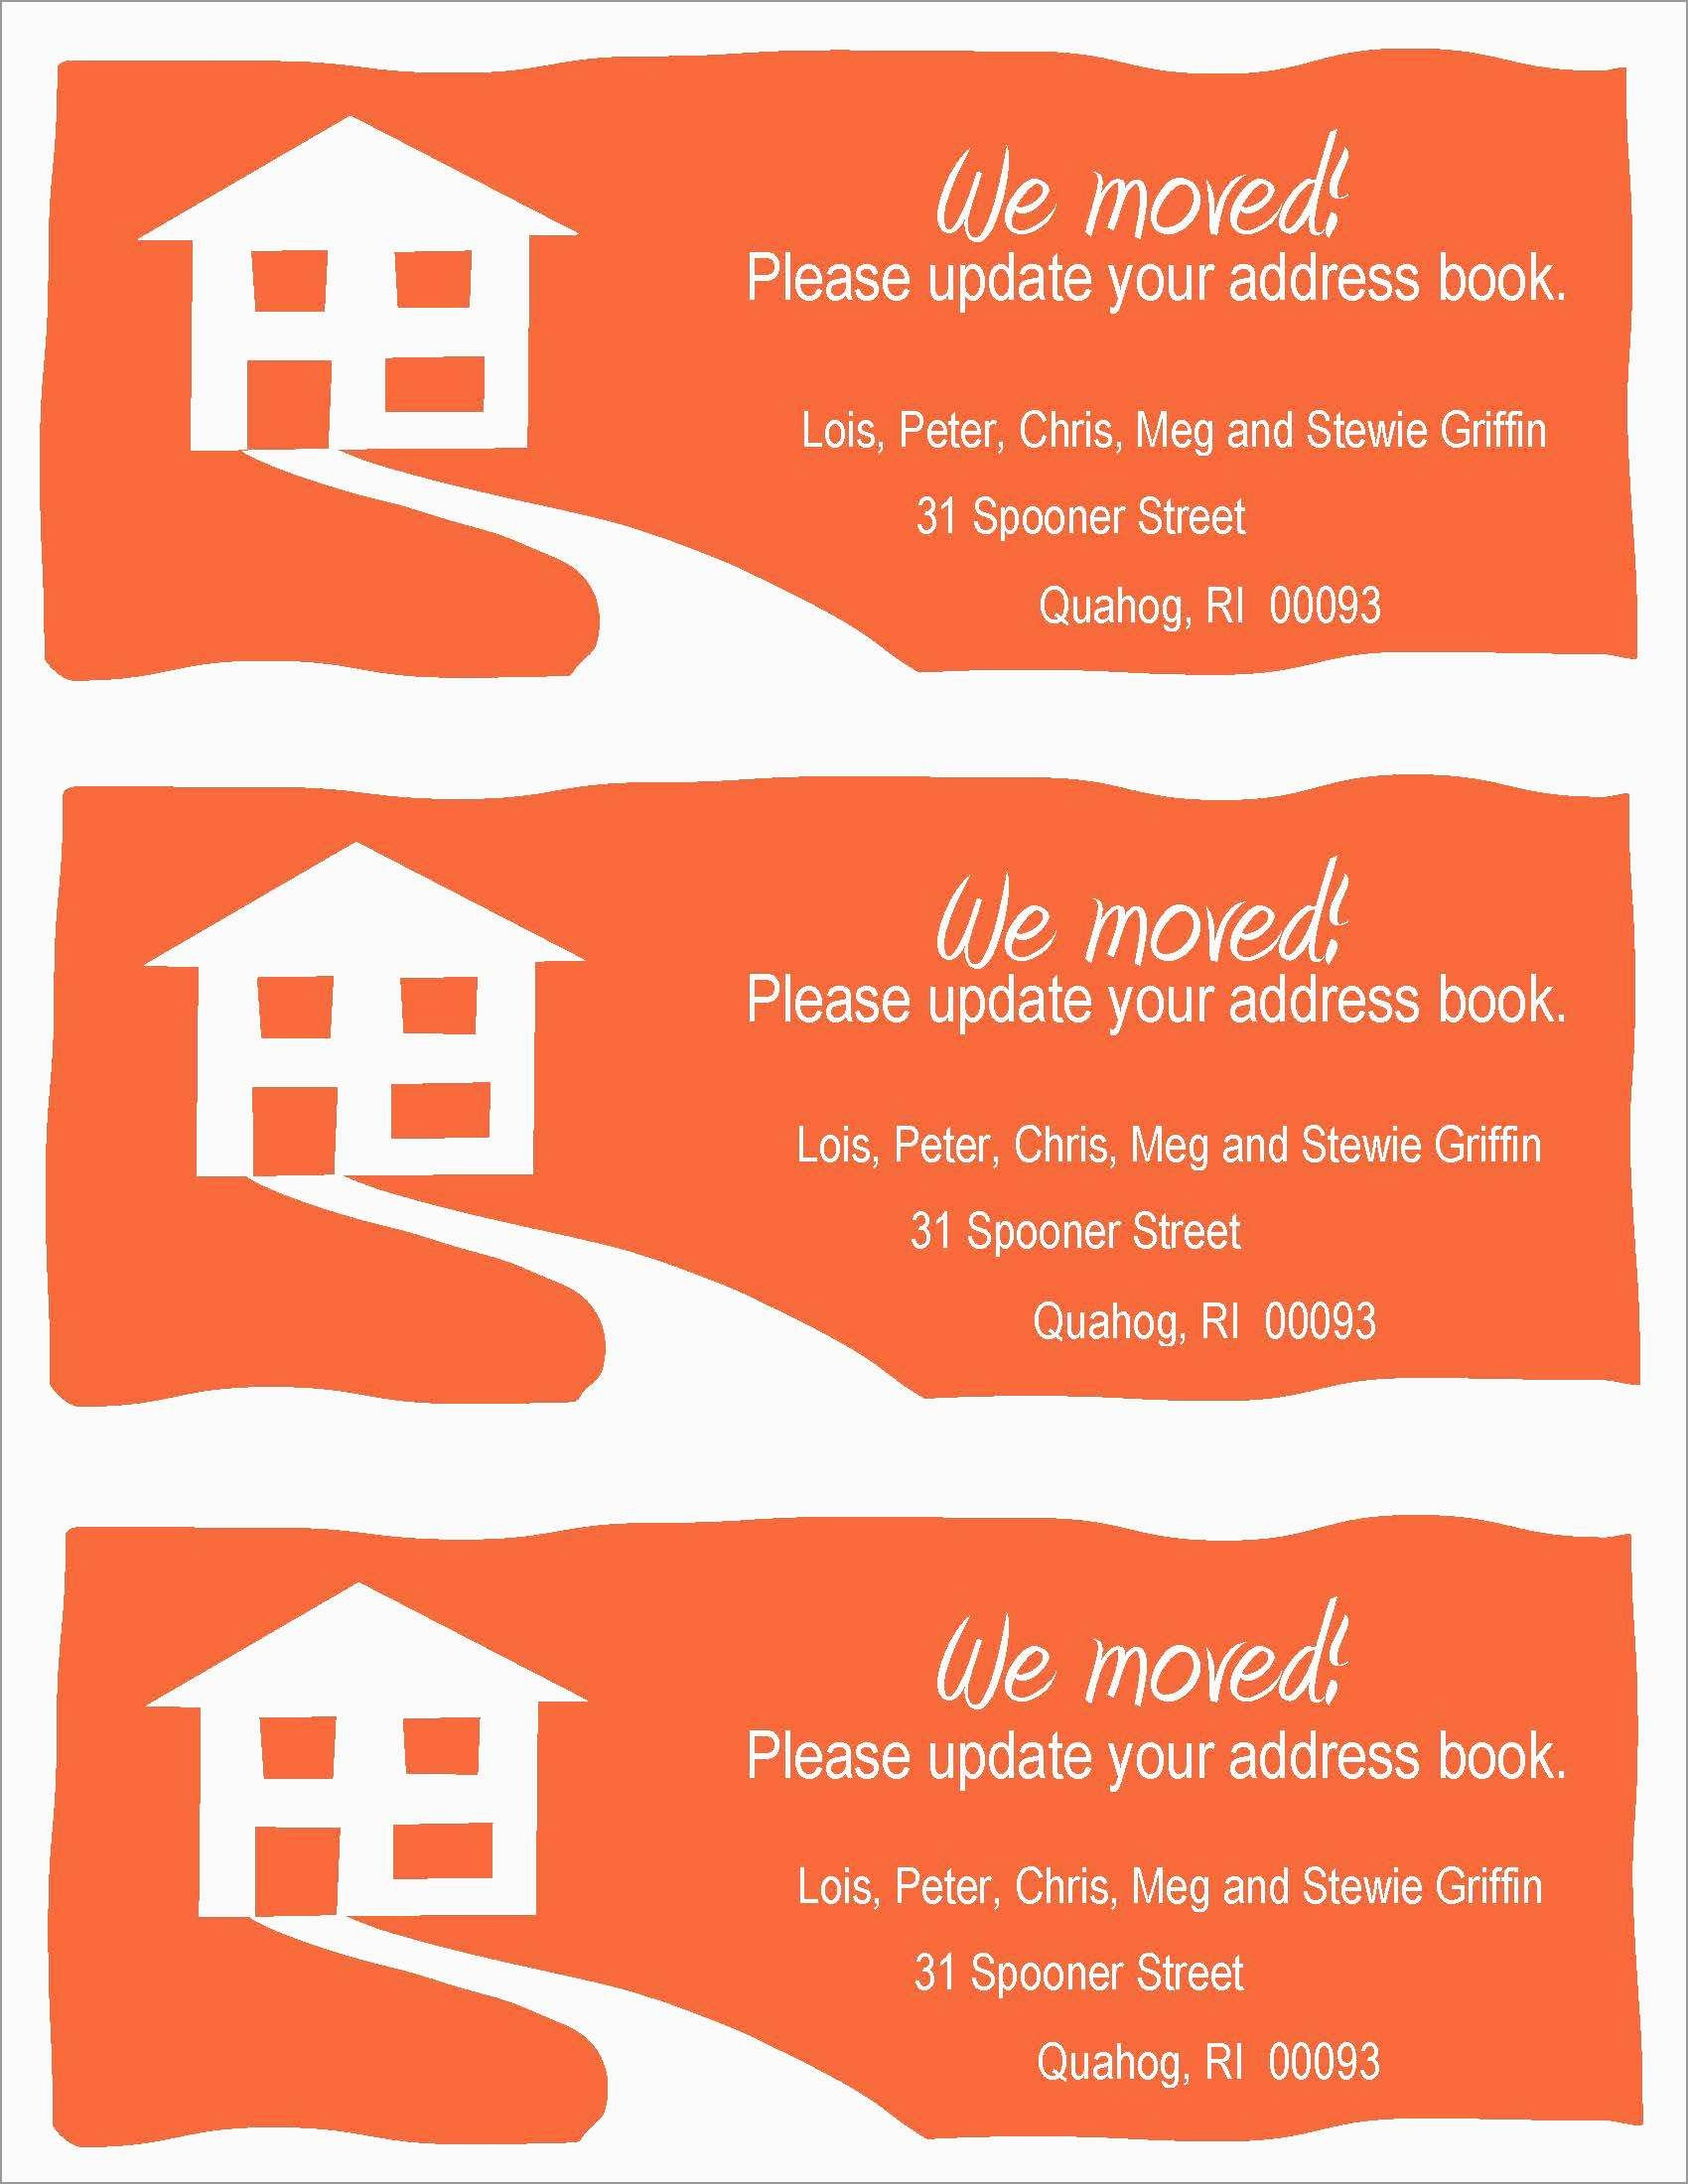 Elegant Free Printable Moving Announcement Templates | Best Of Template - Free Printable Moving Announcement Templates